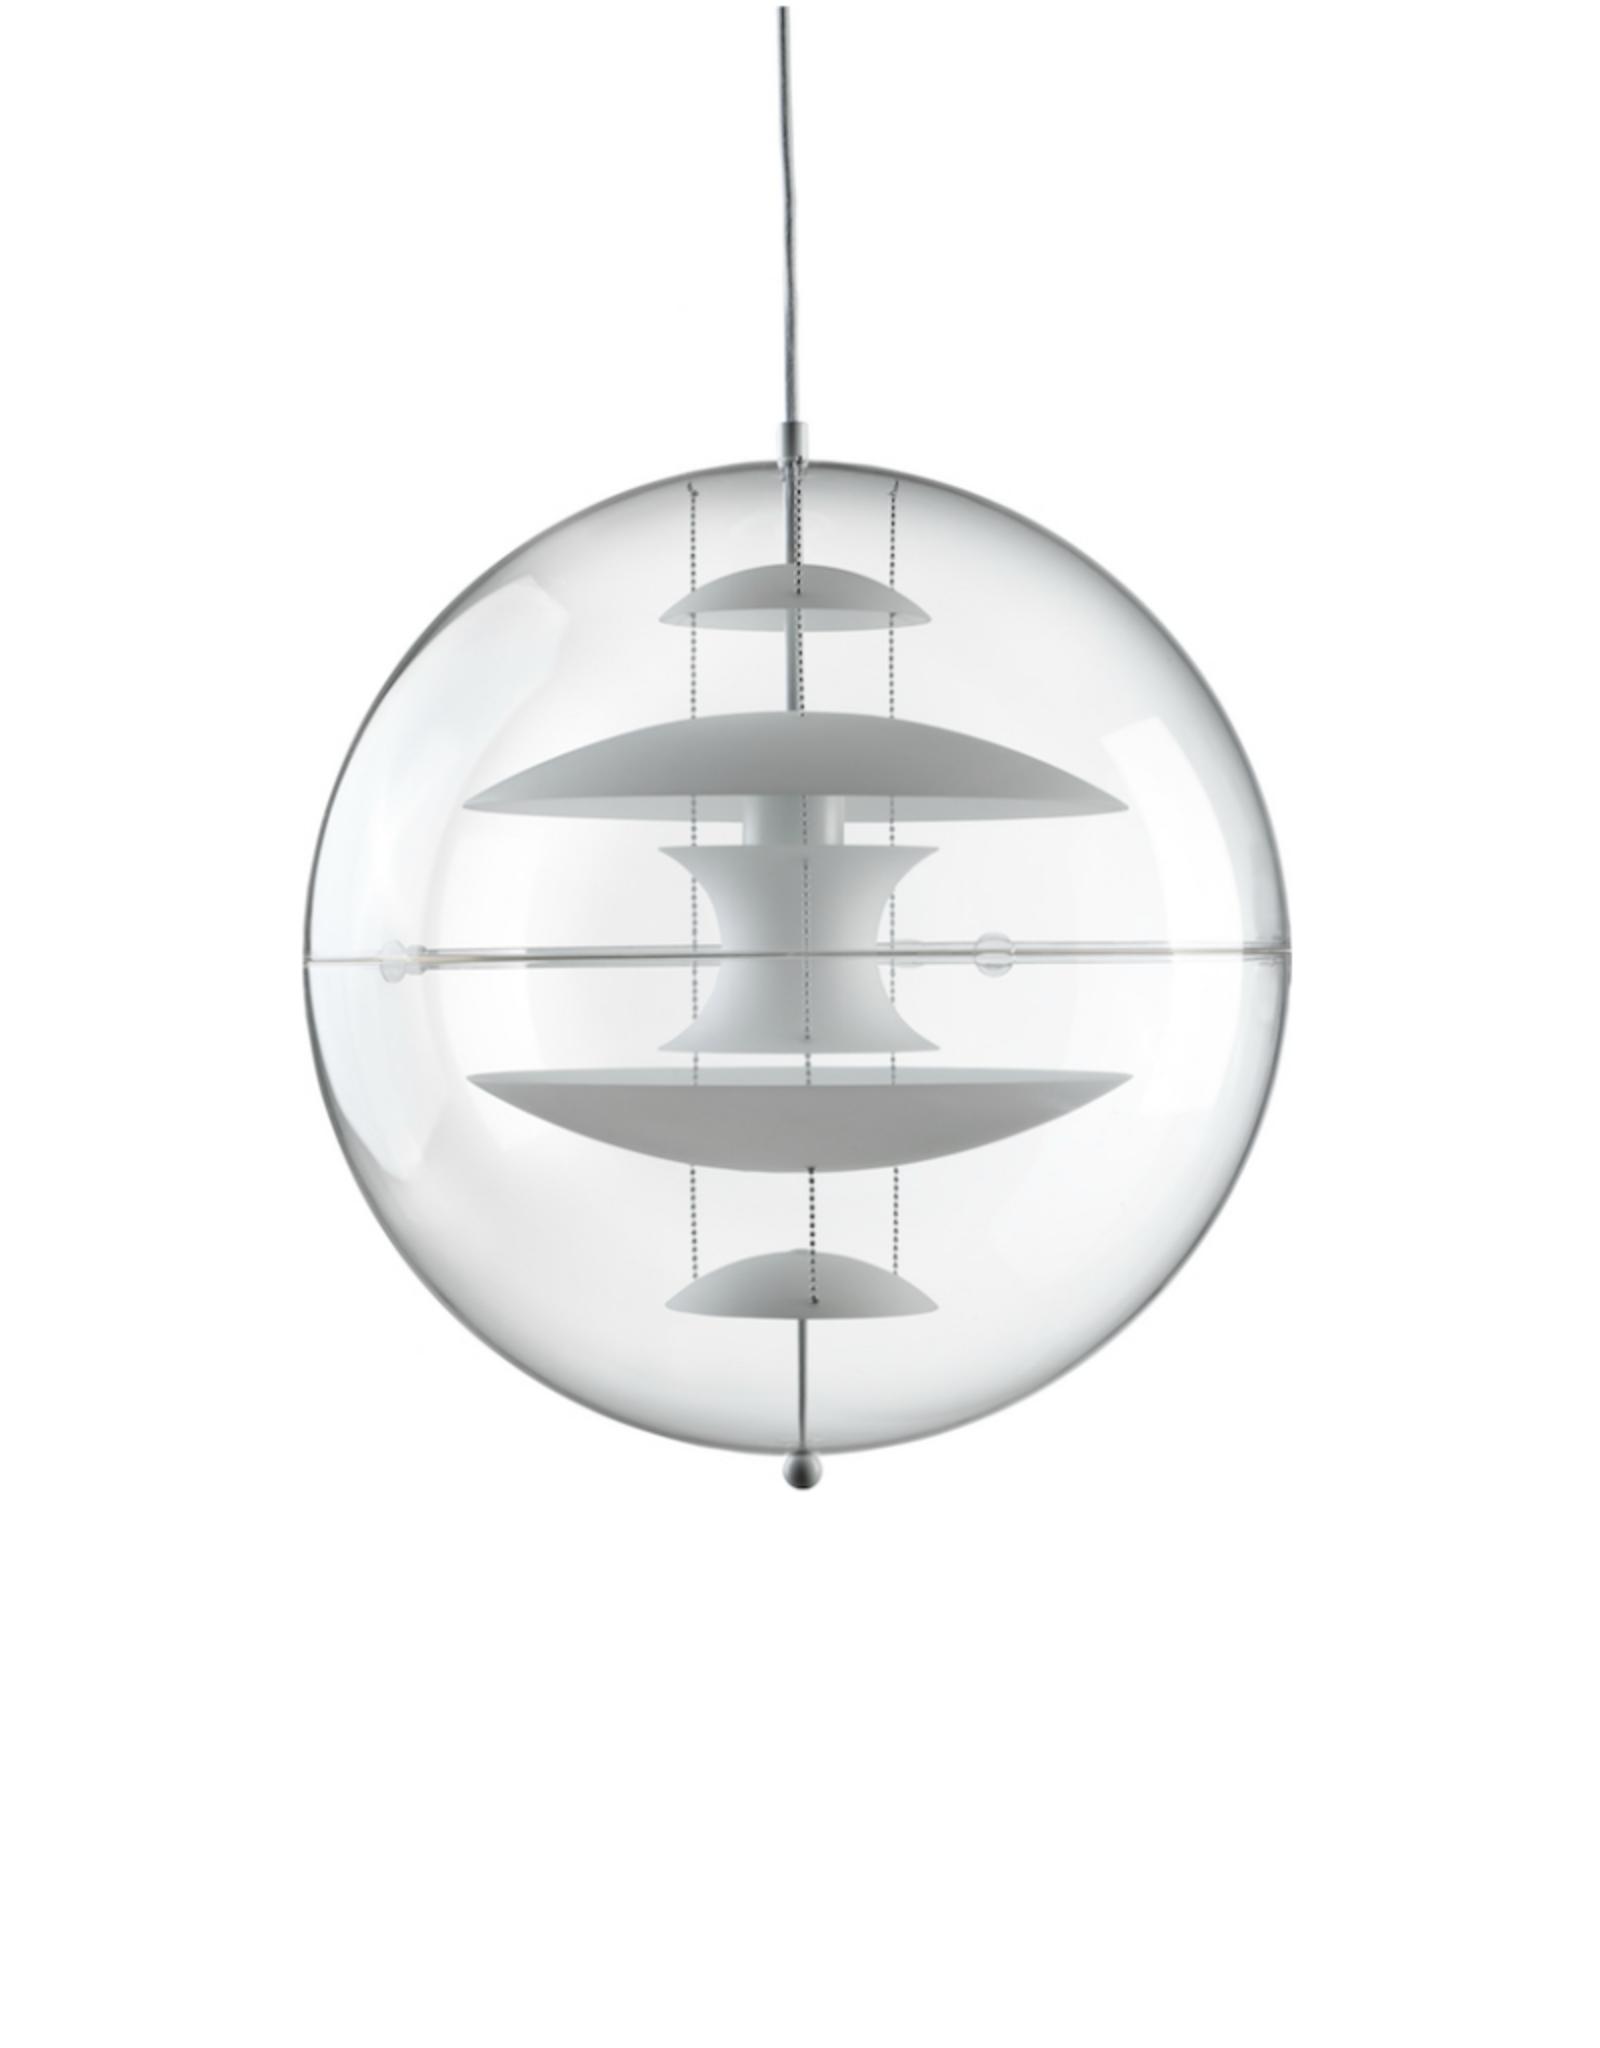 VP 玻璃球吊灯,直径50厘米